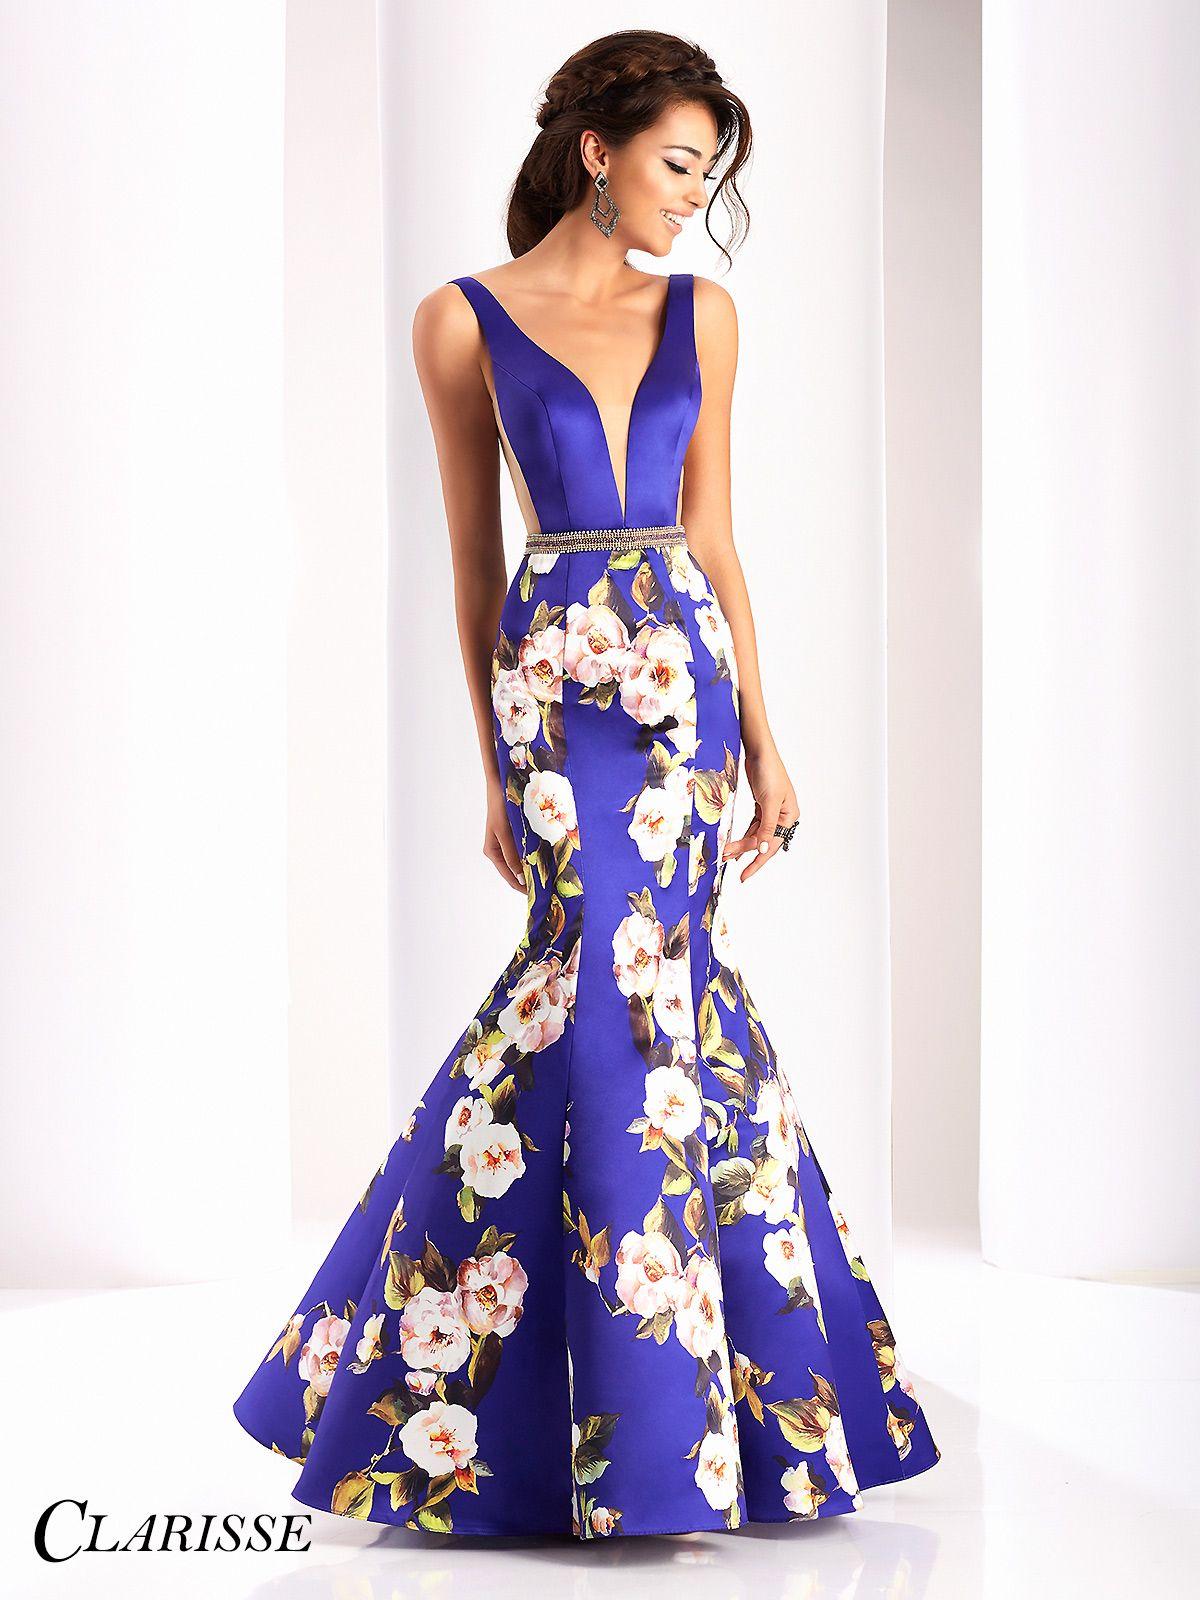 Clarisse Purple Floral Mermaid Prom Dress 4813